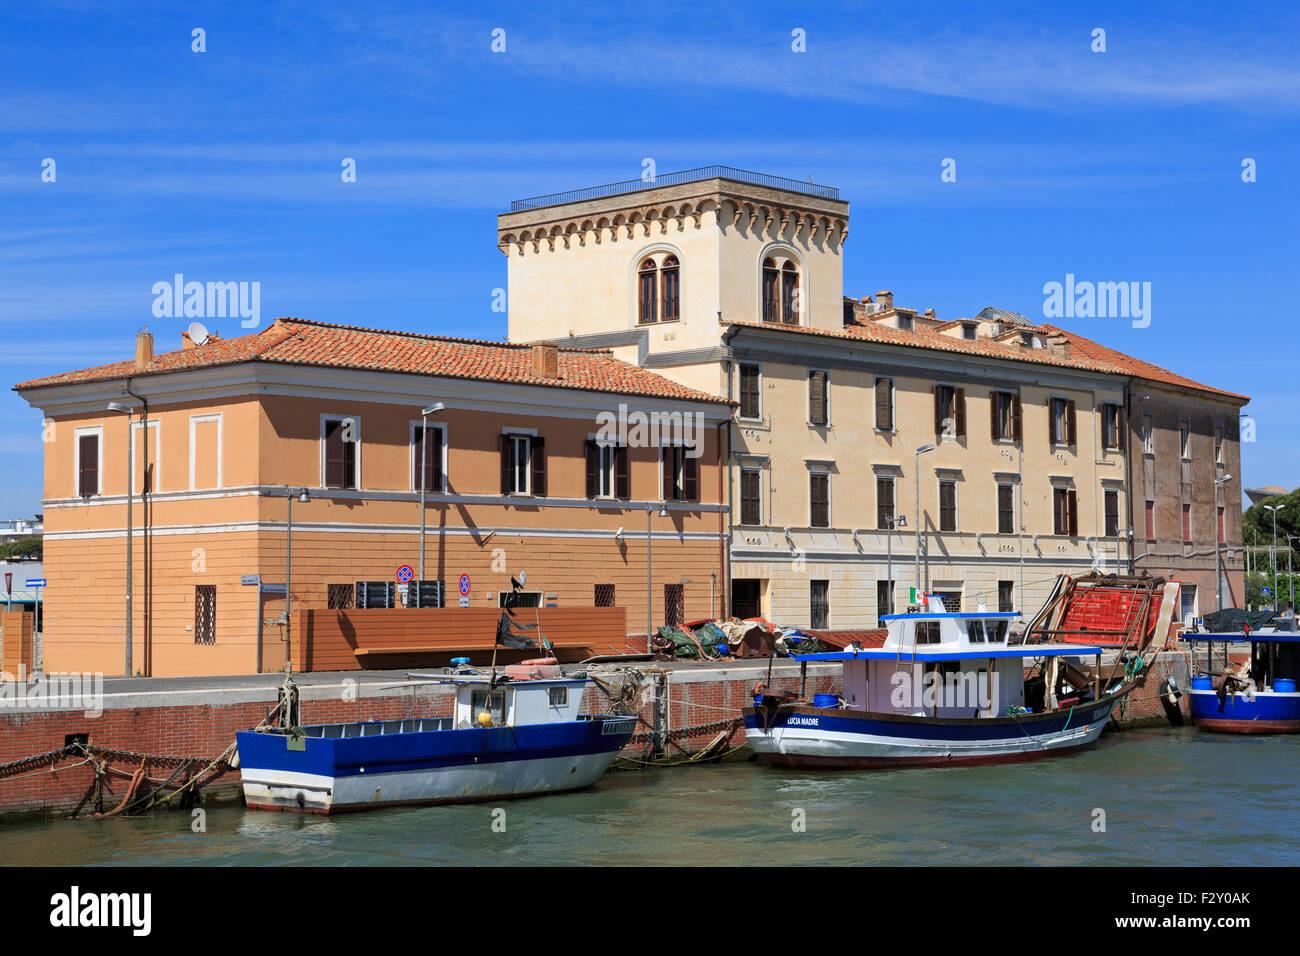 Port of Fiumicino, Rome, Italy, Europe - Stock Image